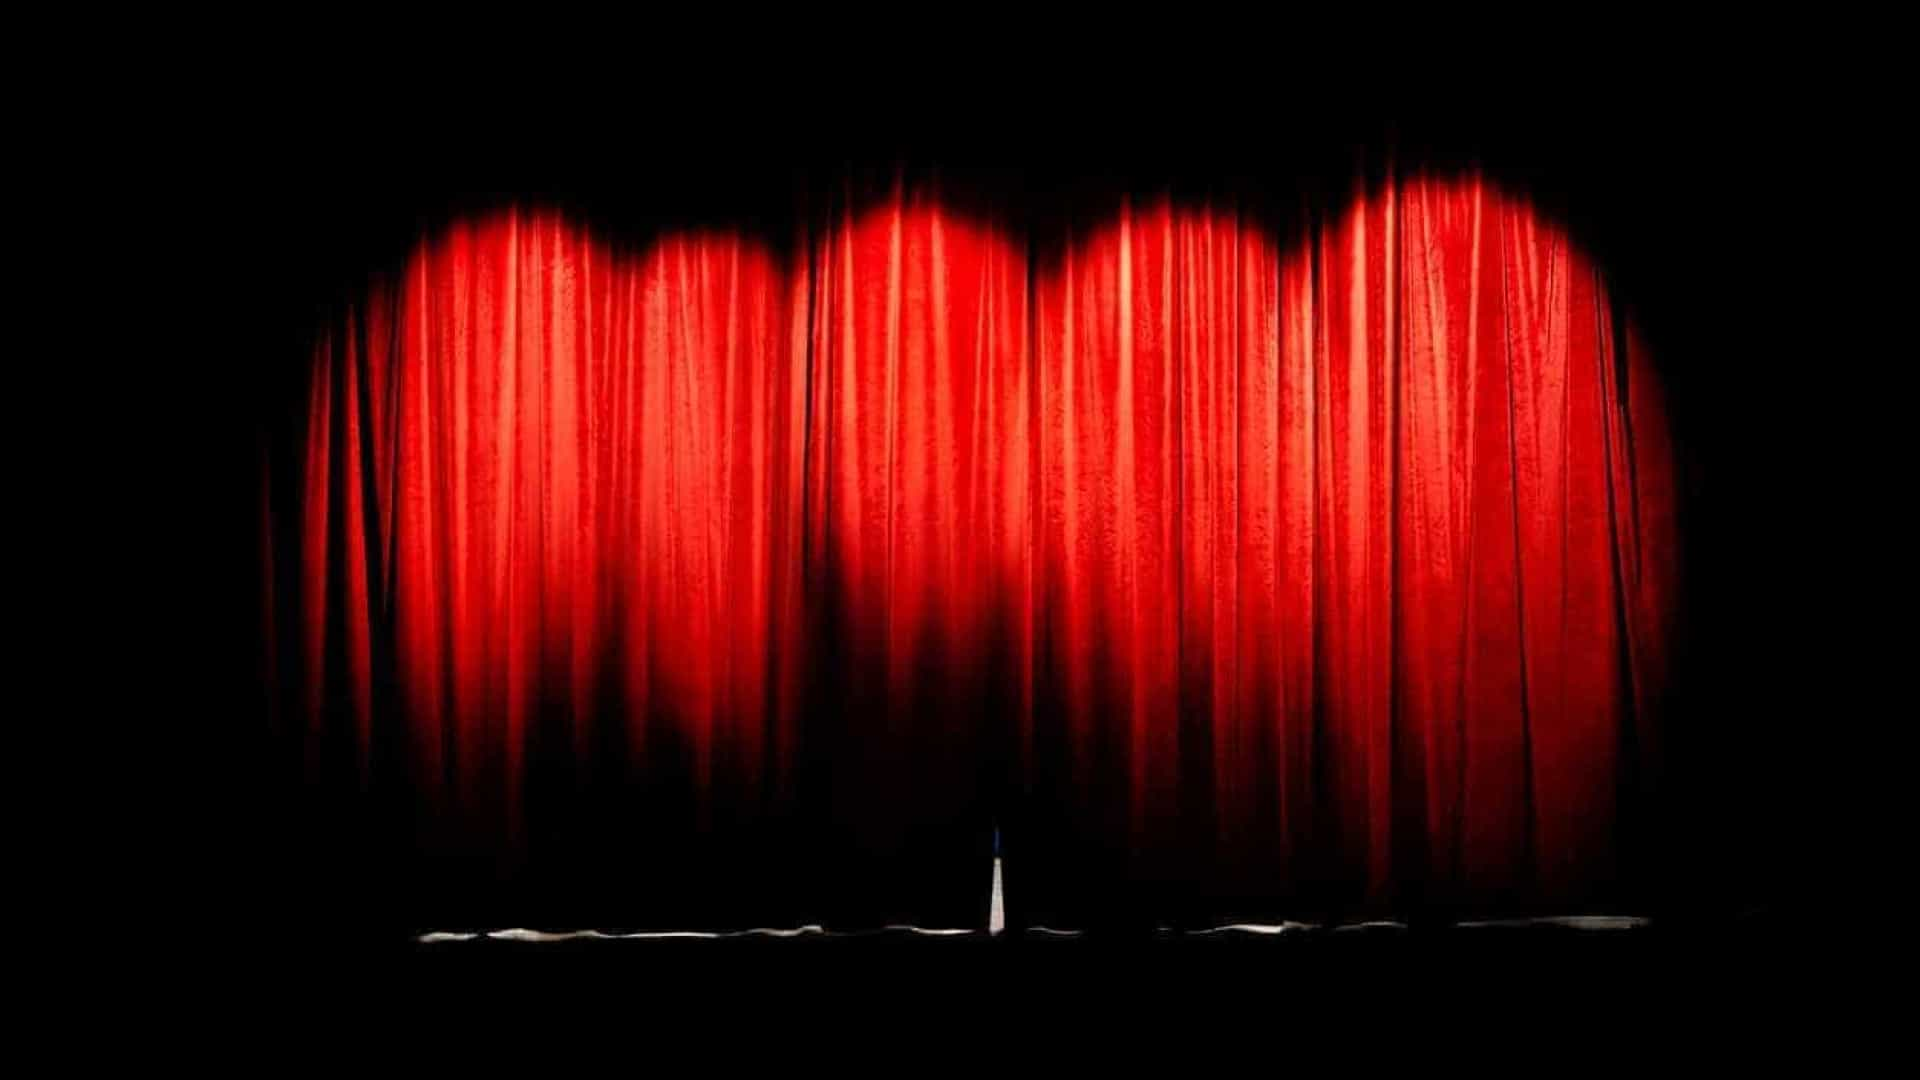 A Europa como miragem no teatro de Davide Carnevali